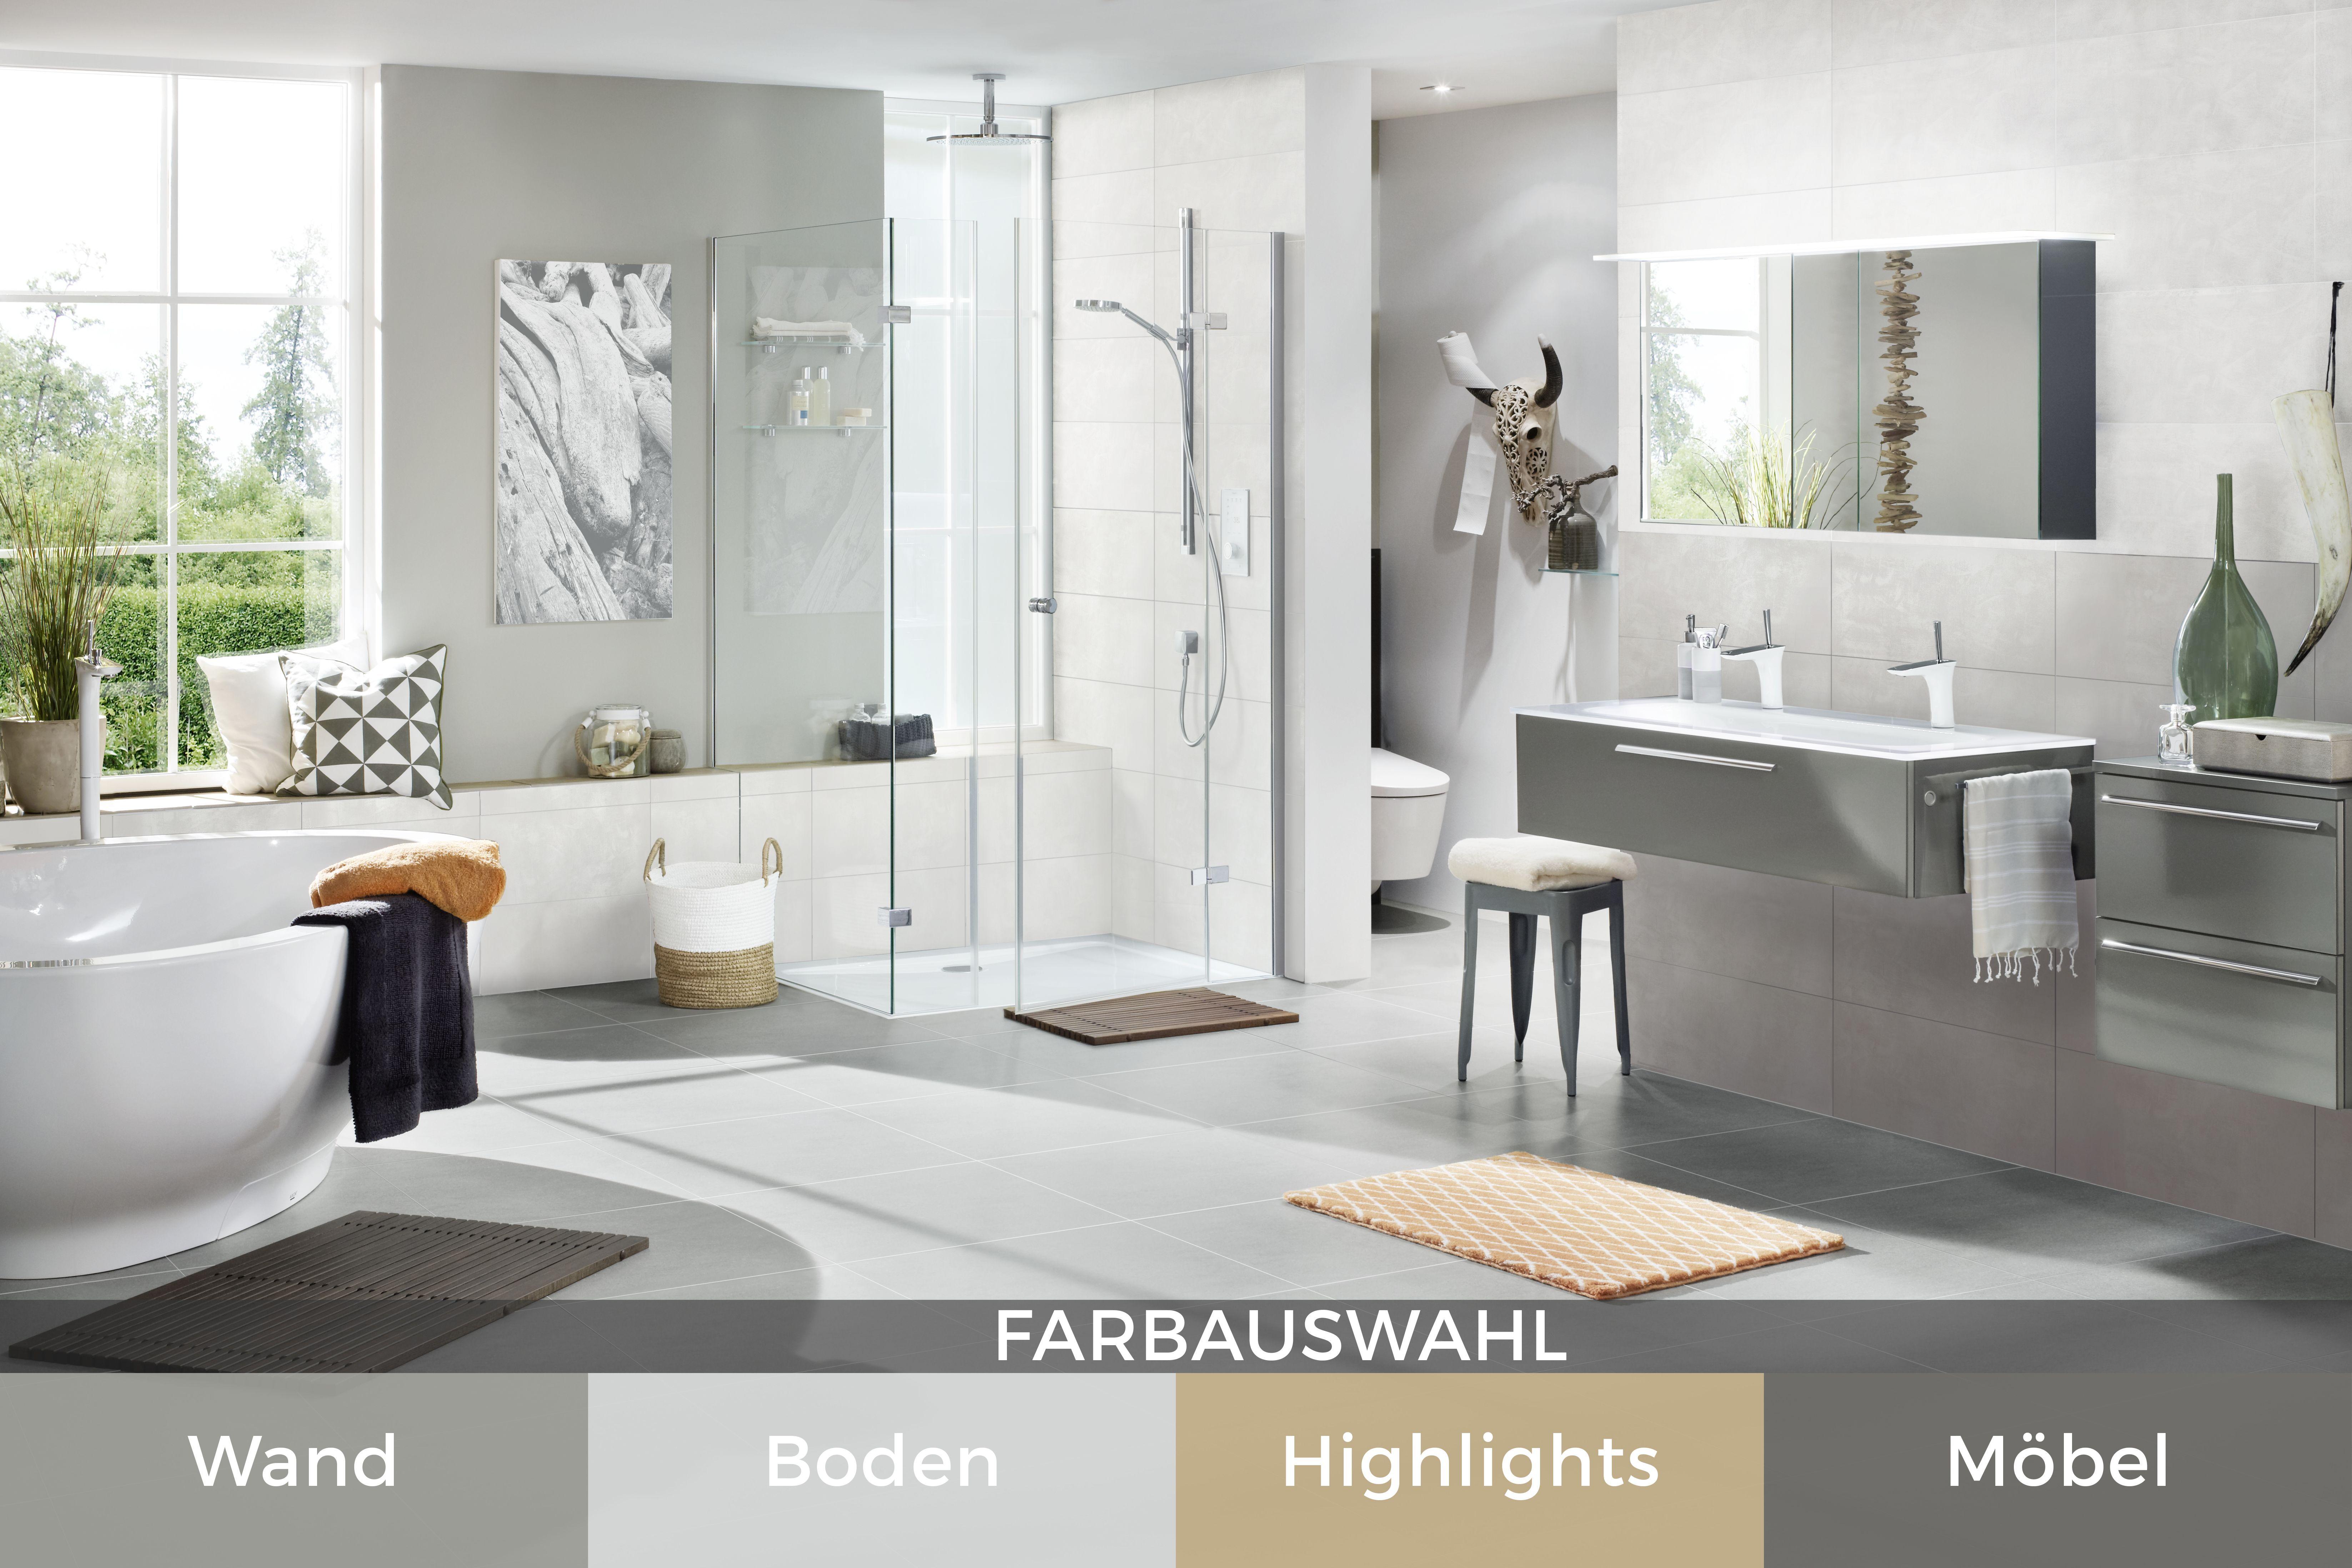 Fantastisch Das Badezimmer Neu Gestalten #Badezimmer #Bathroom #ideen #fliesen #tiles  #highlights